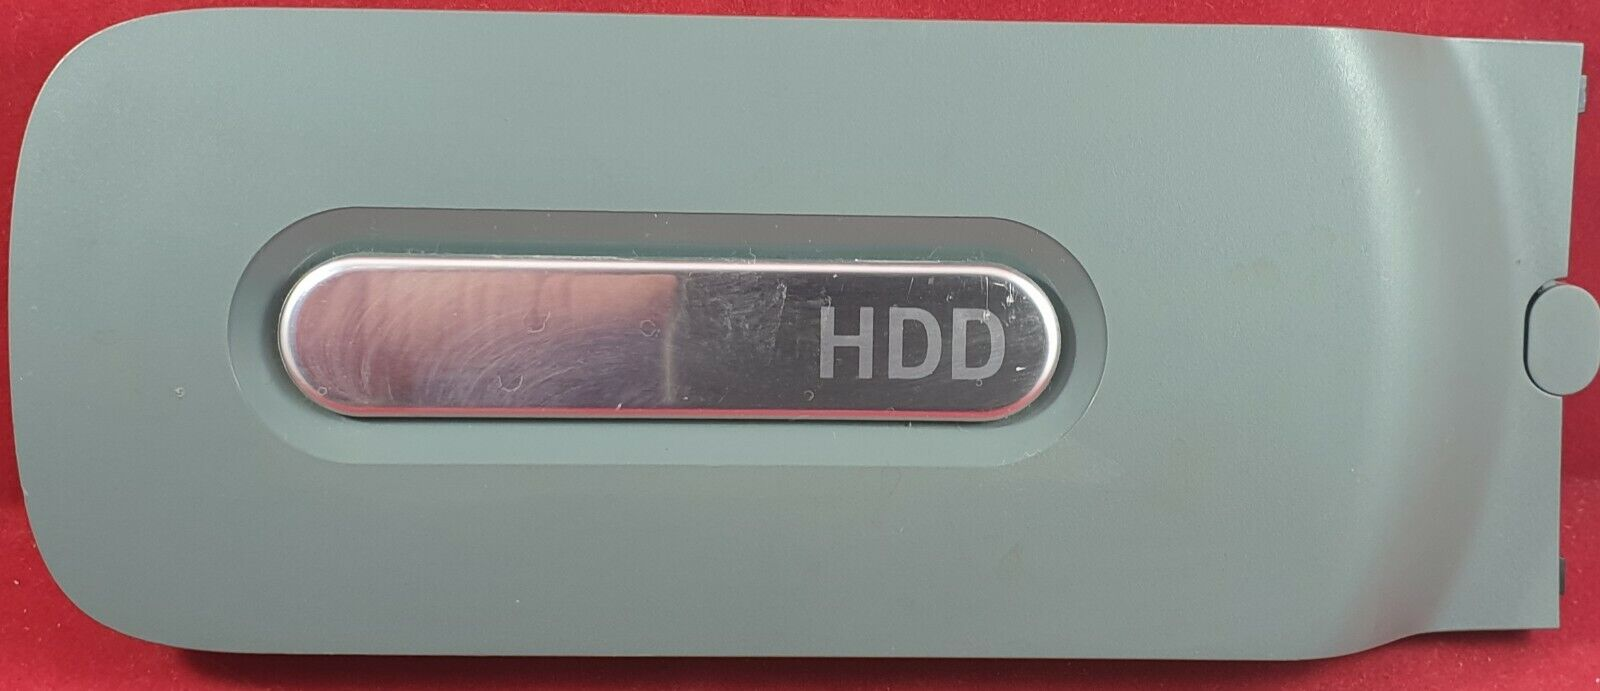 20GB HDD Hard Drive Microsoft Xbox 360 VGC